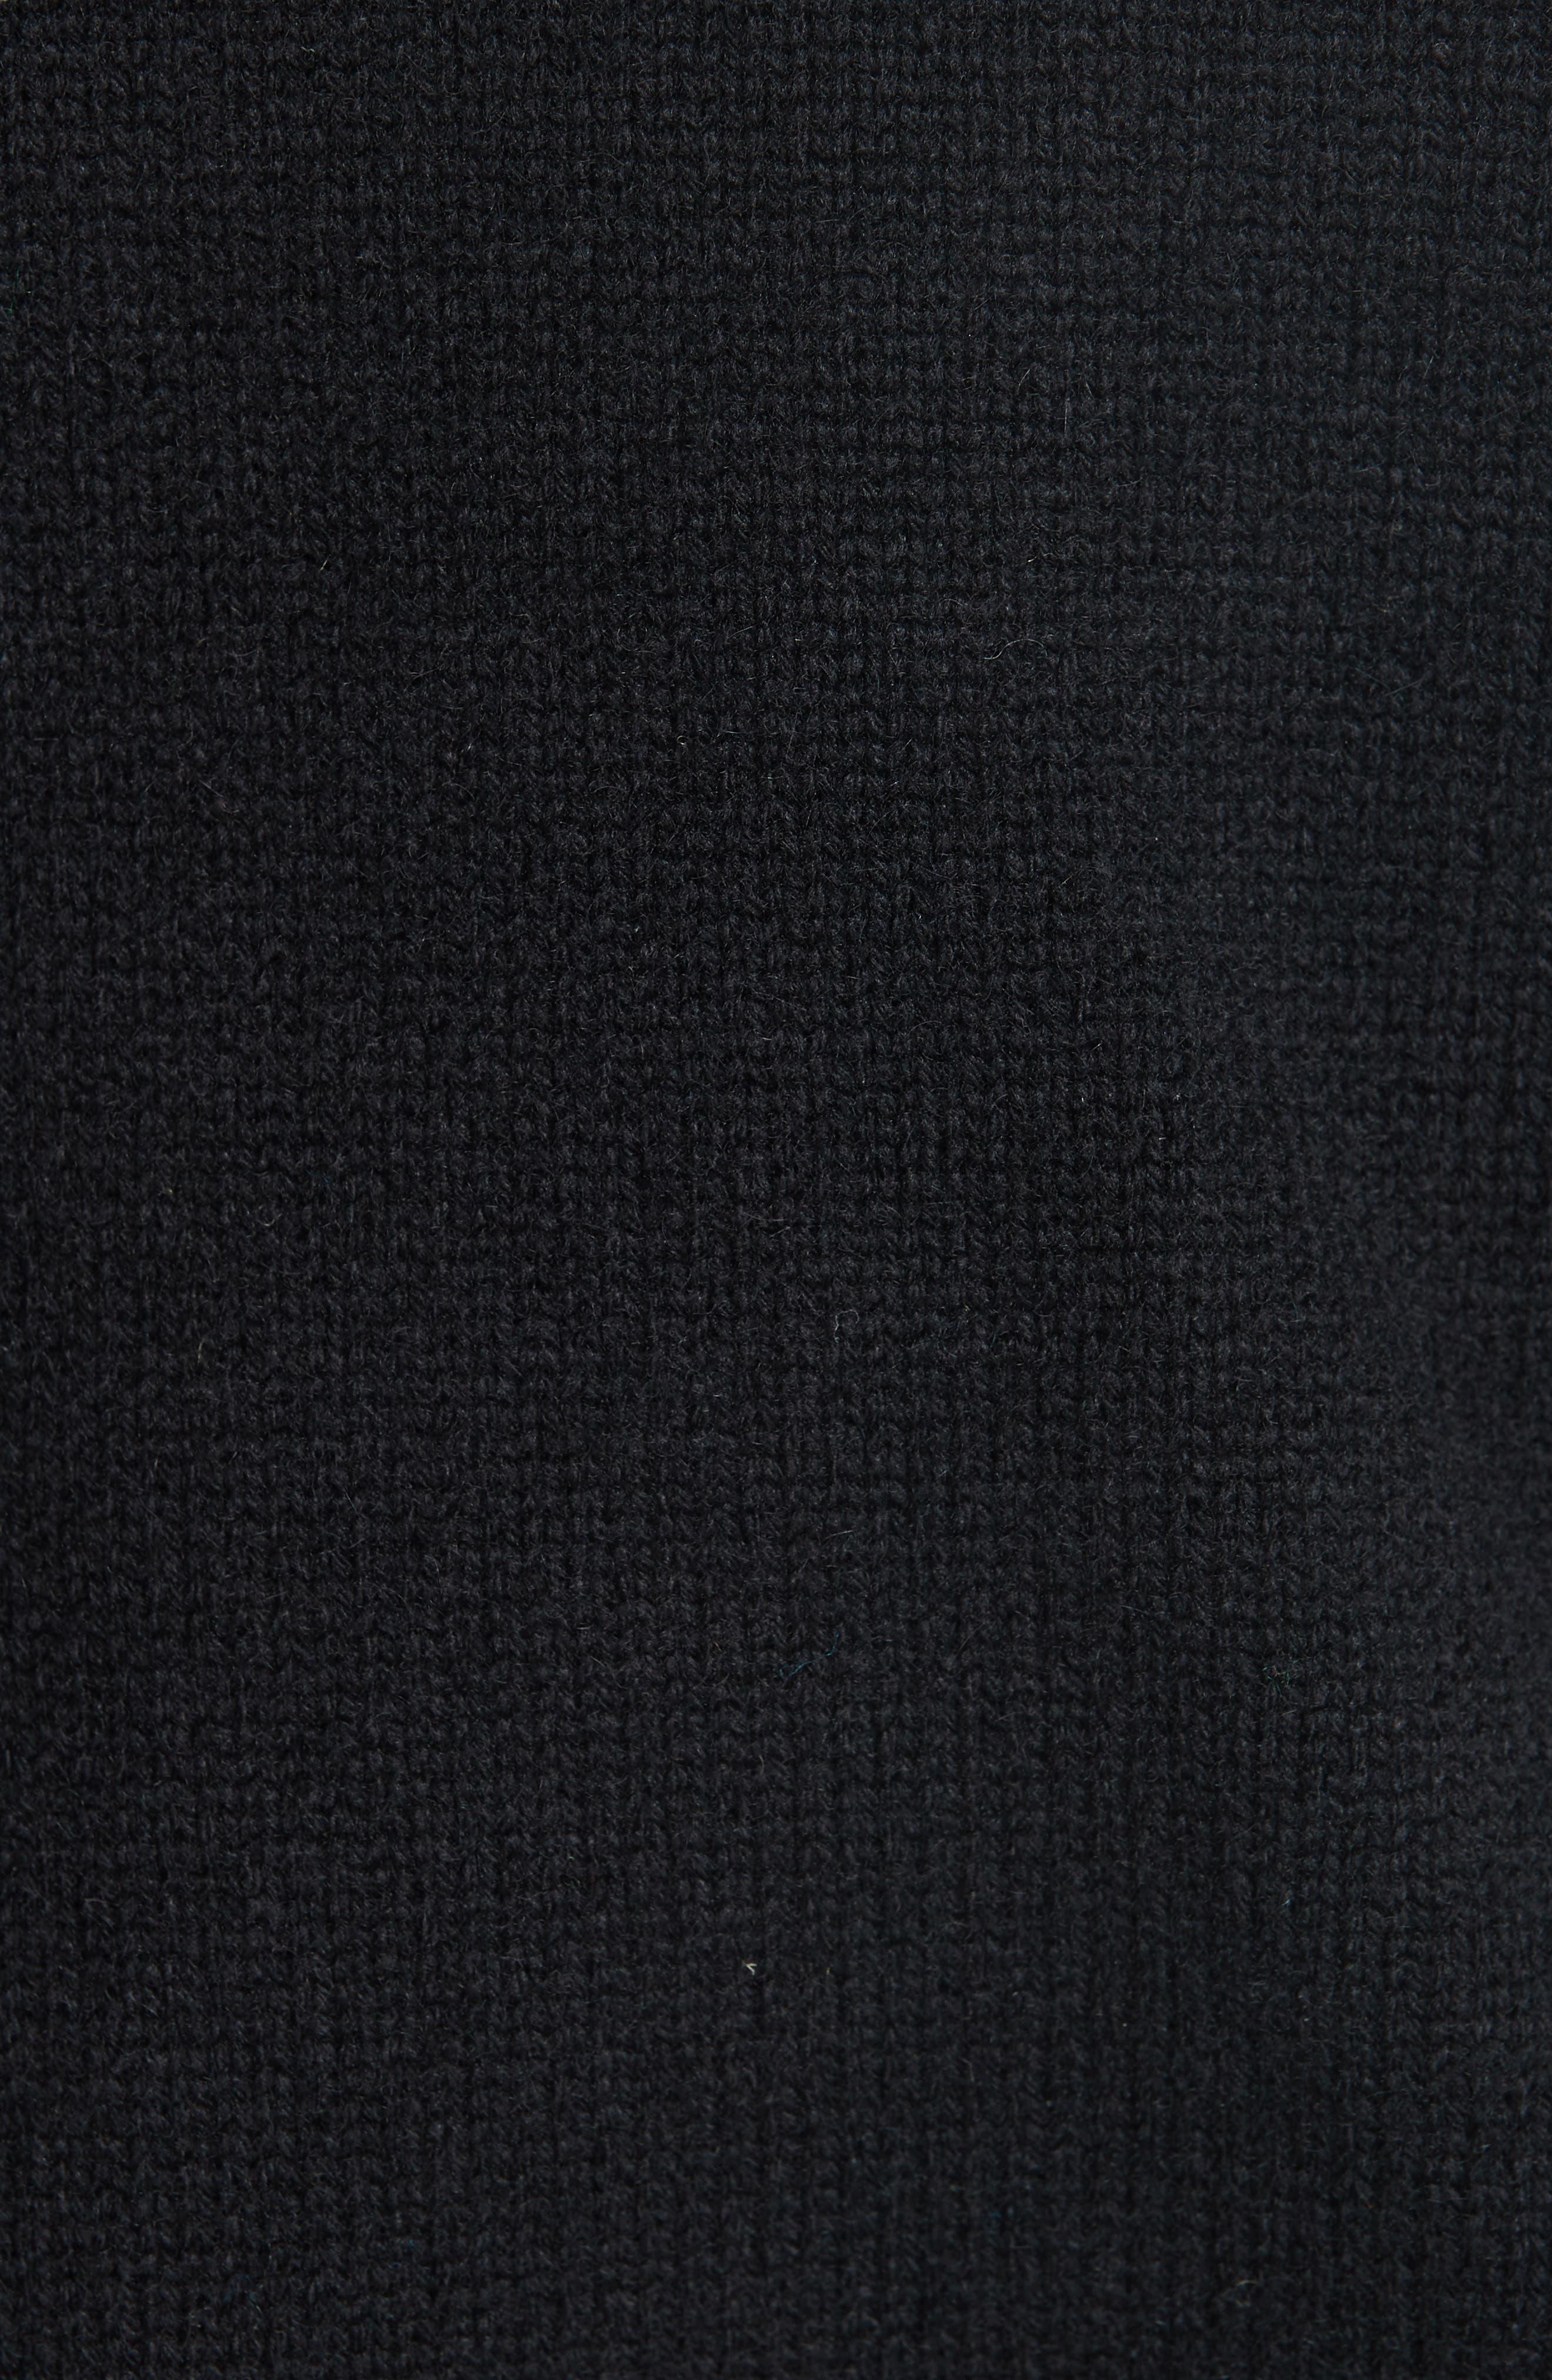 Cashmere Stripe Sleeve Sweater,                             Alternate thumbnail 5, color,                             001